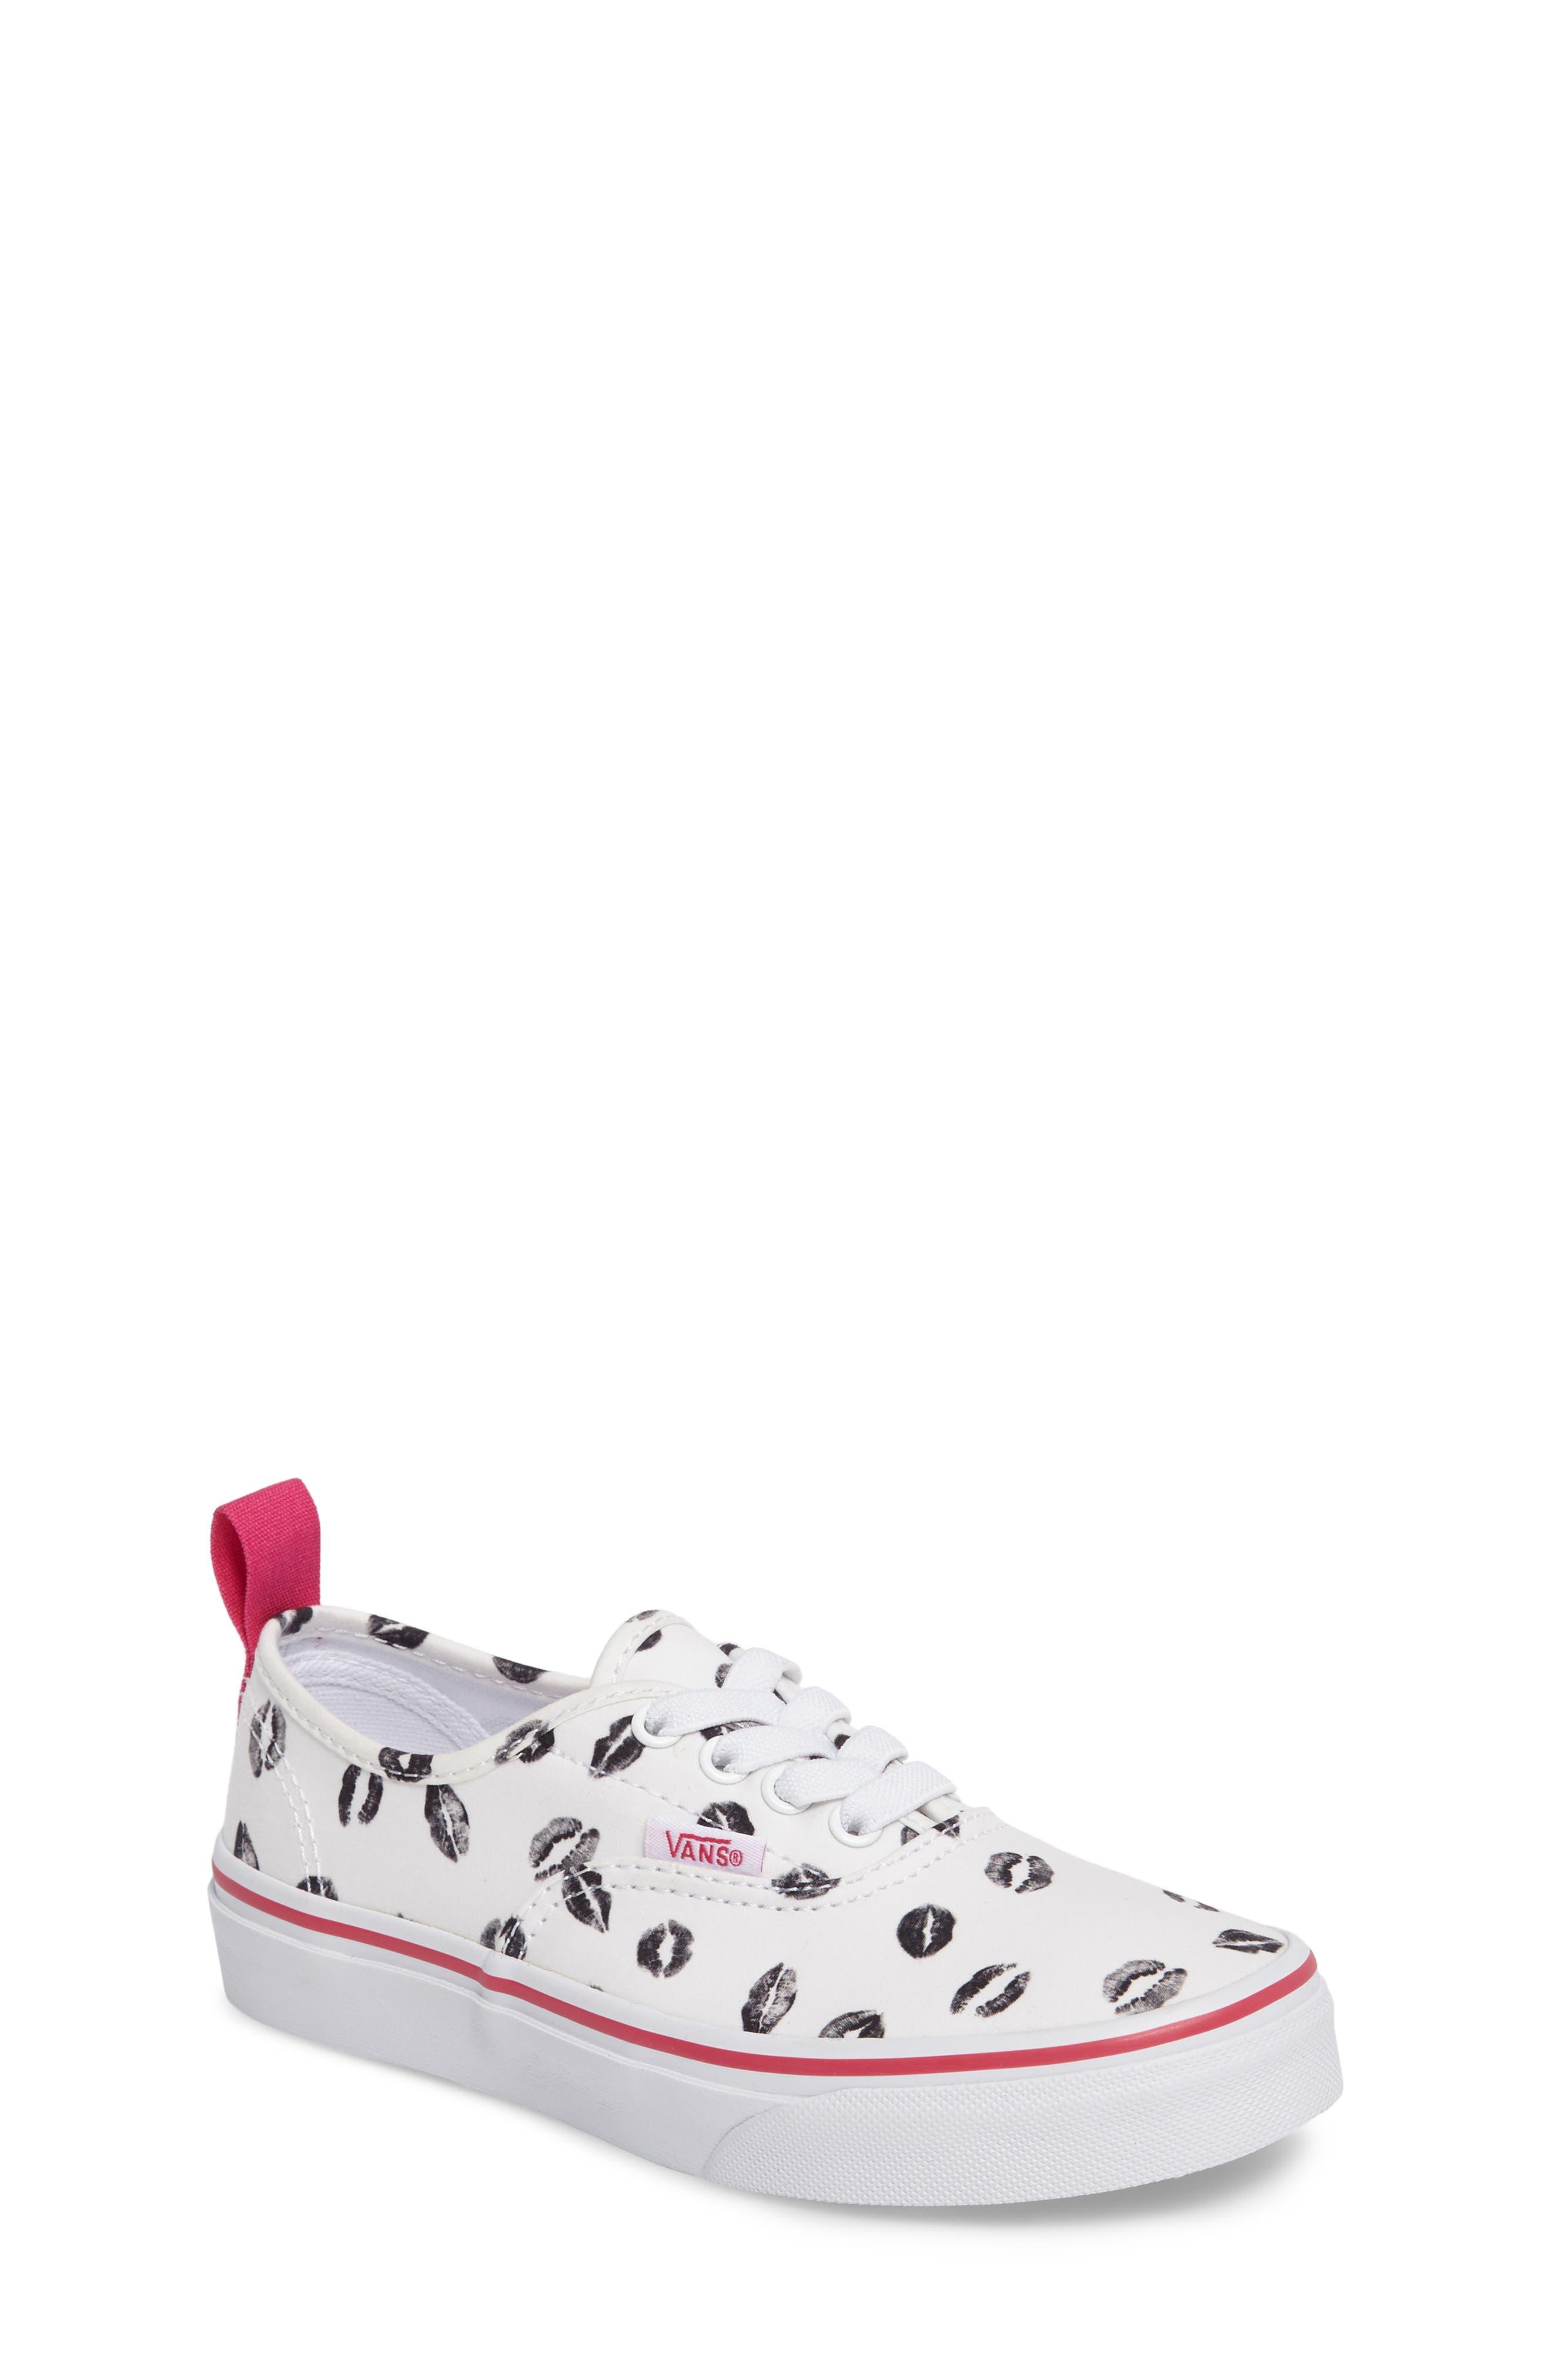 VANS Valentines Authentic Elastic Lace Sneaker